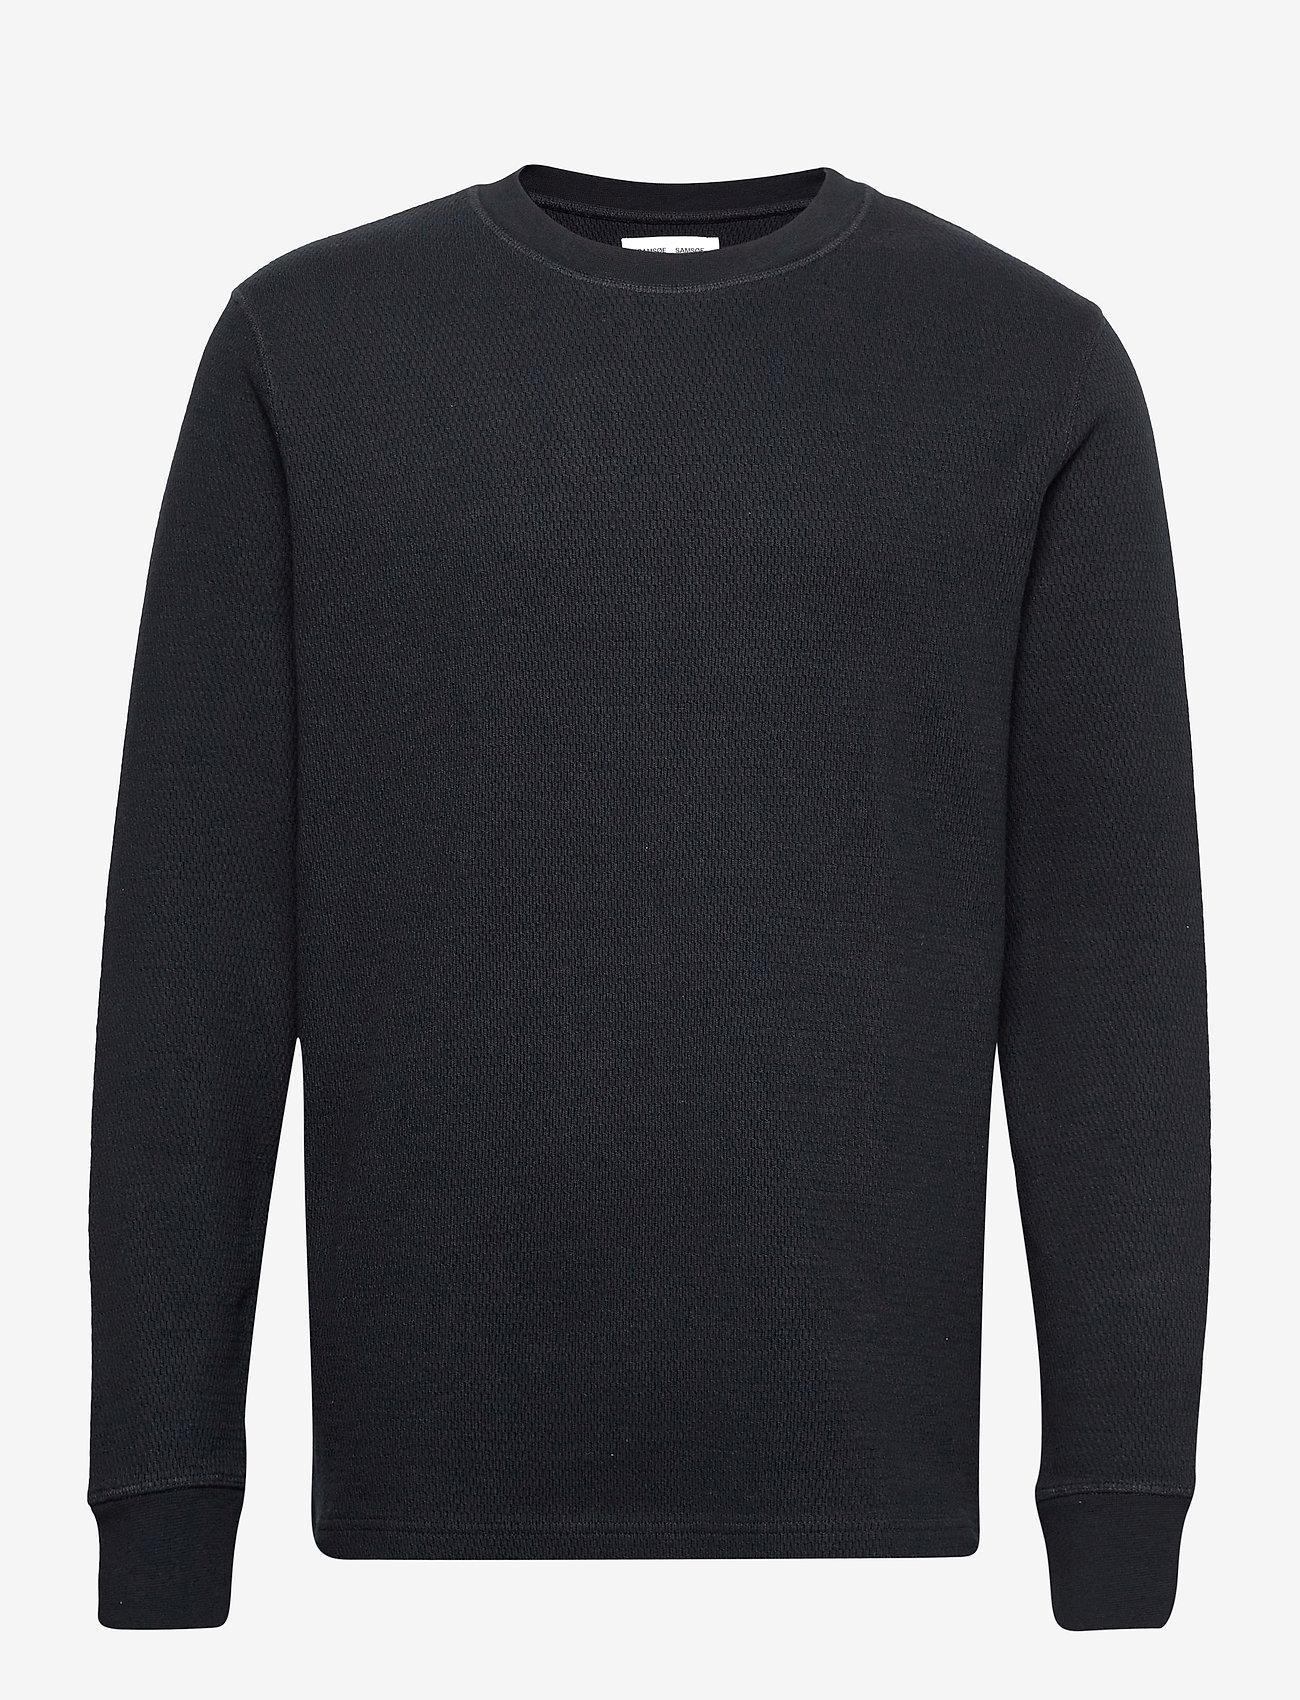 Samsøe Samsøe - Chidi t-shirt ls 11597 - t-shirts basiques - sky captain - 0